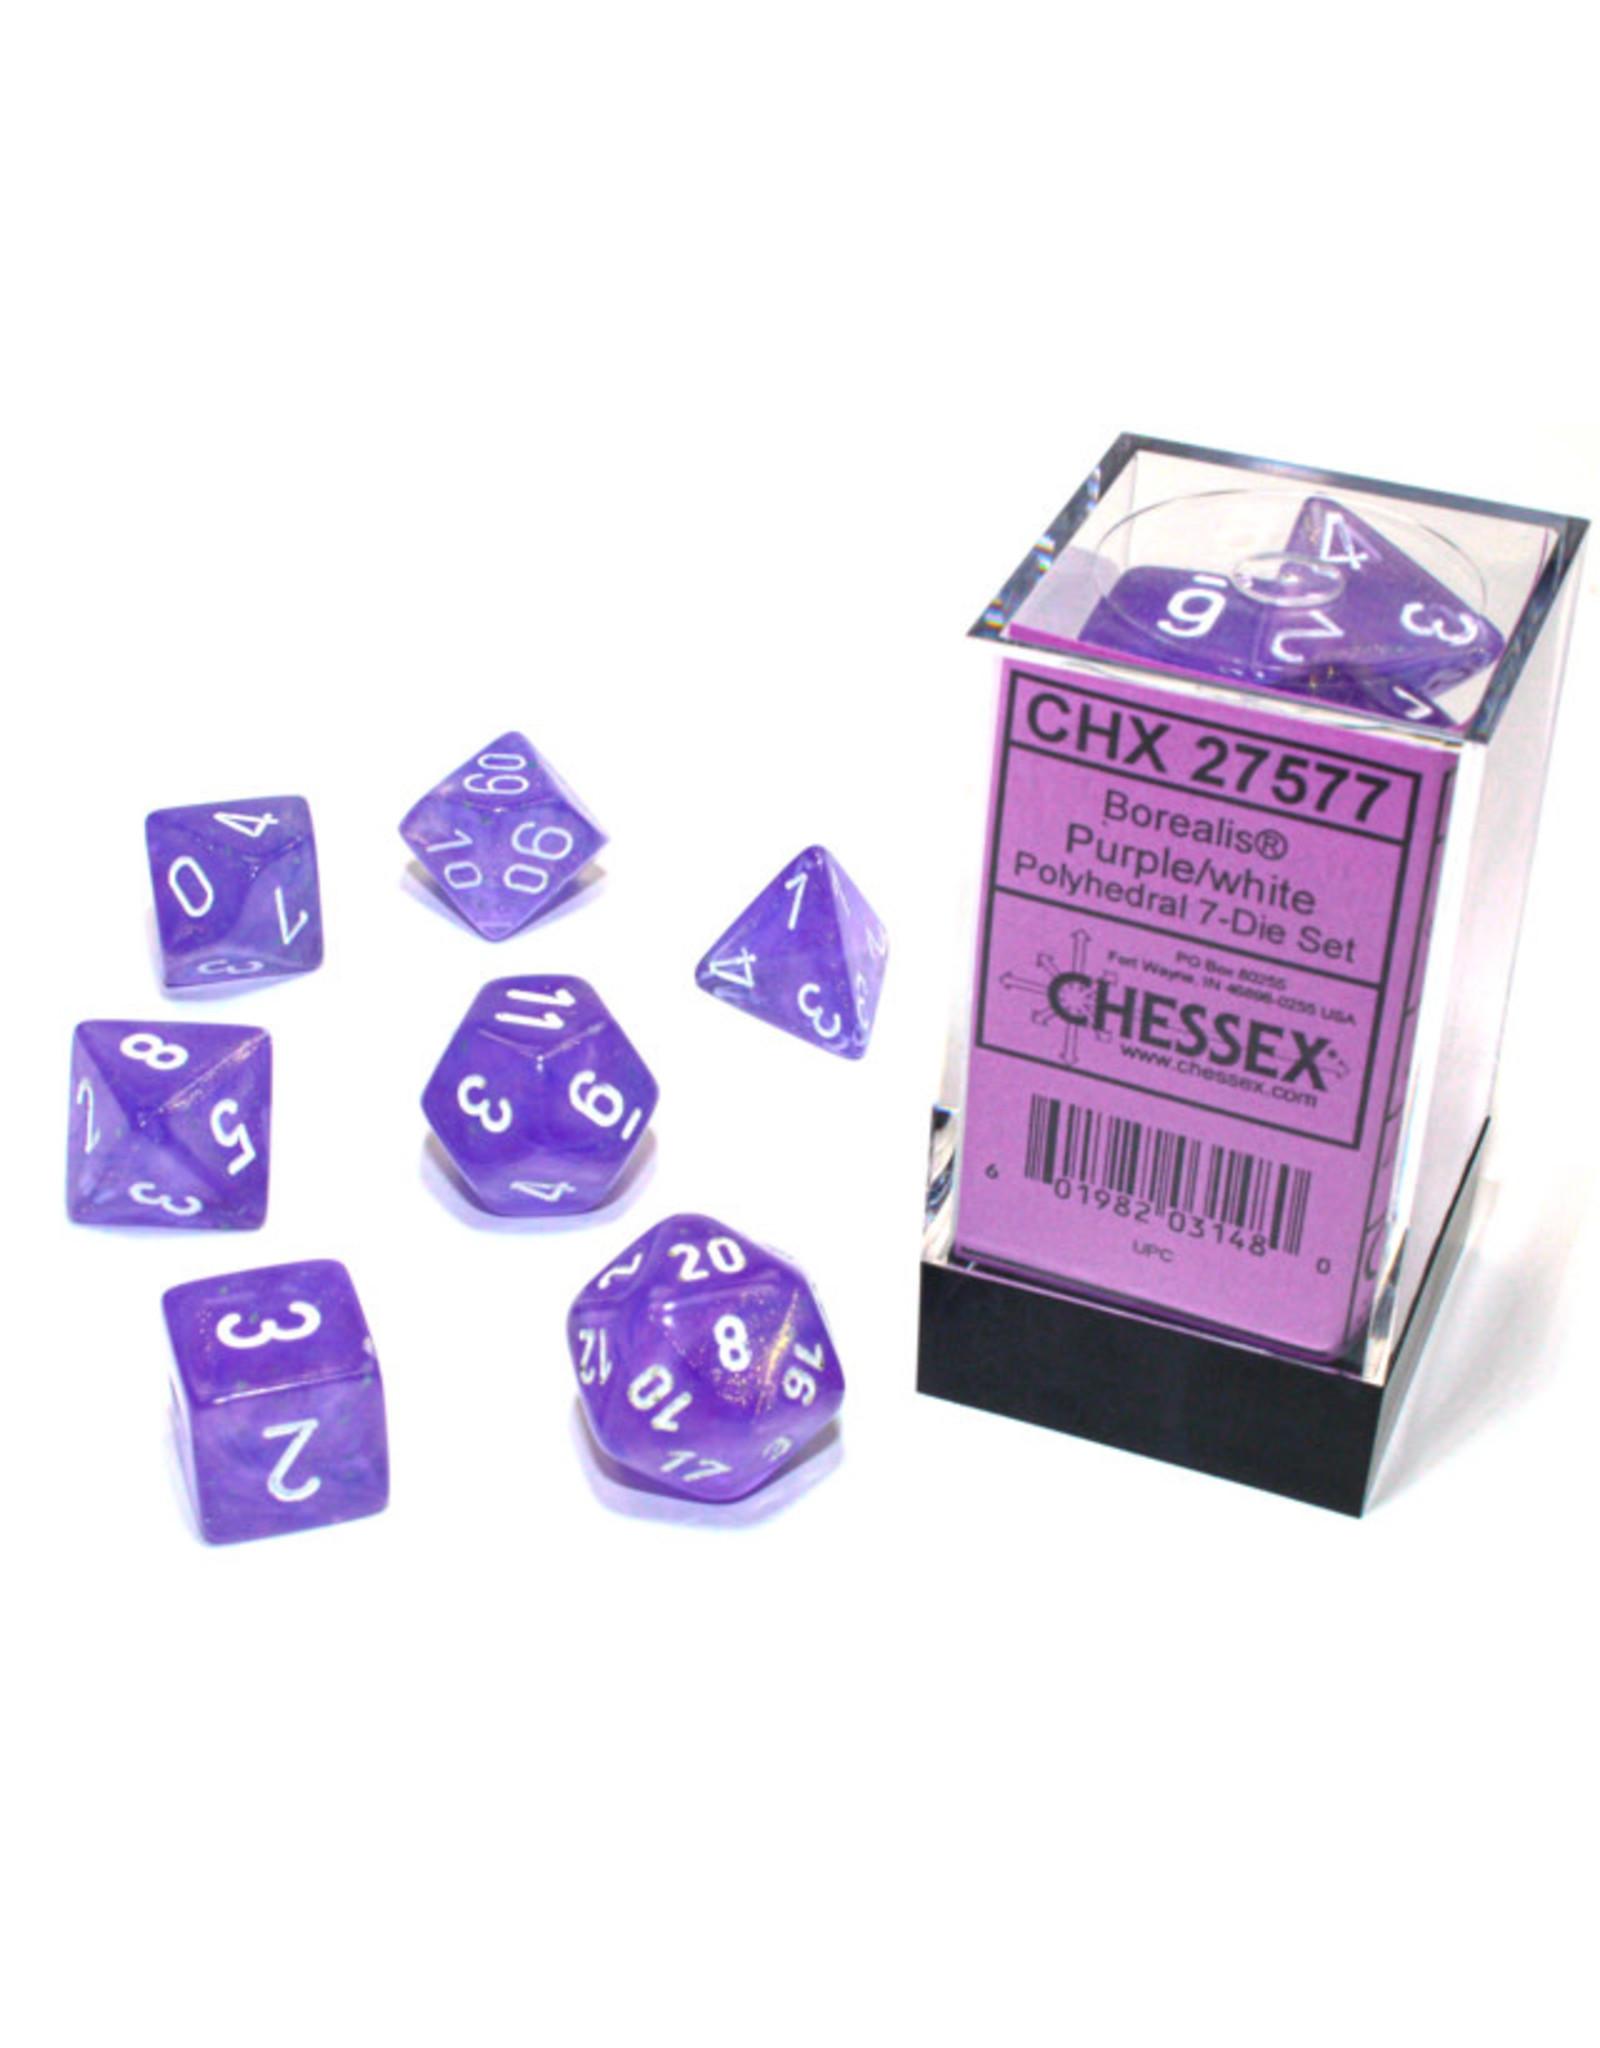 Chessex Borealis: Polyhedral Purple/white Luminary 7-Die Set CHX 27577